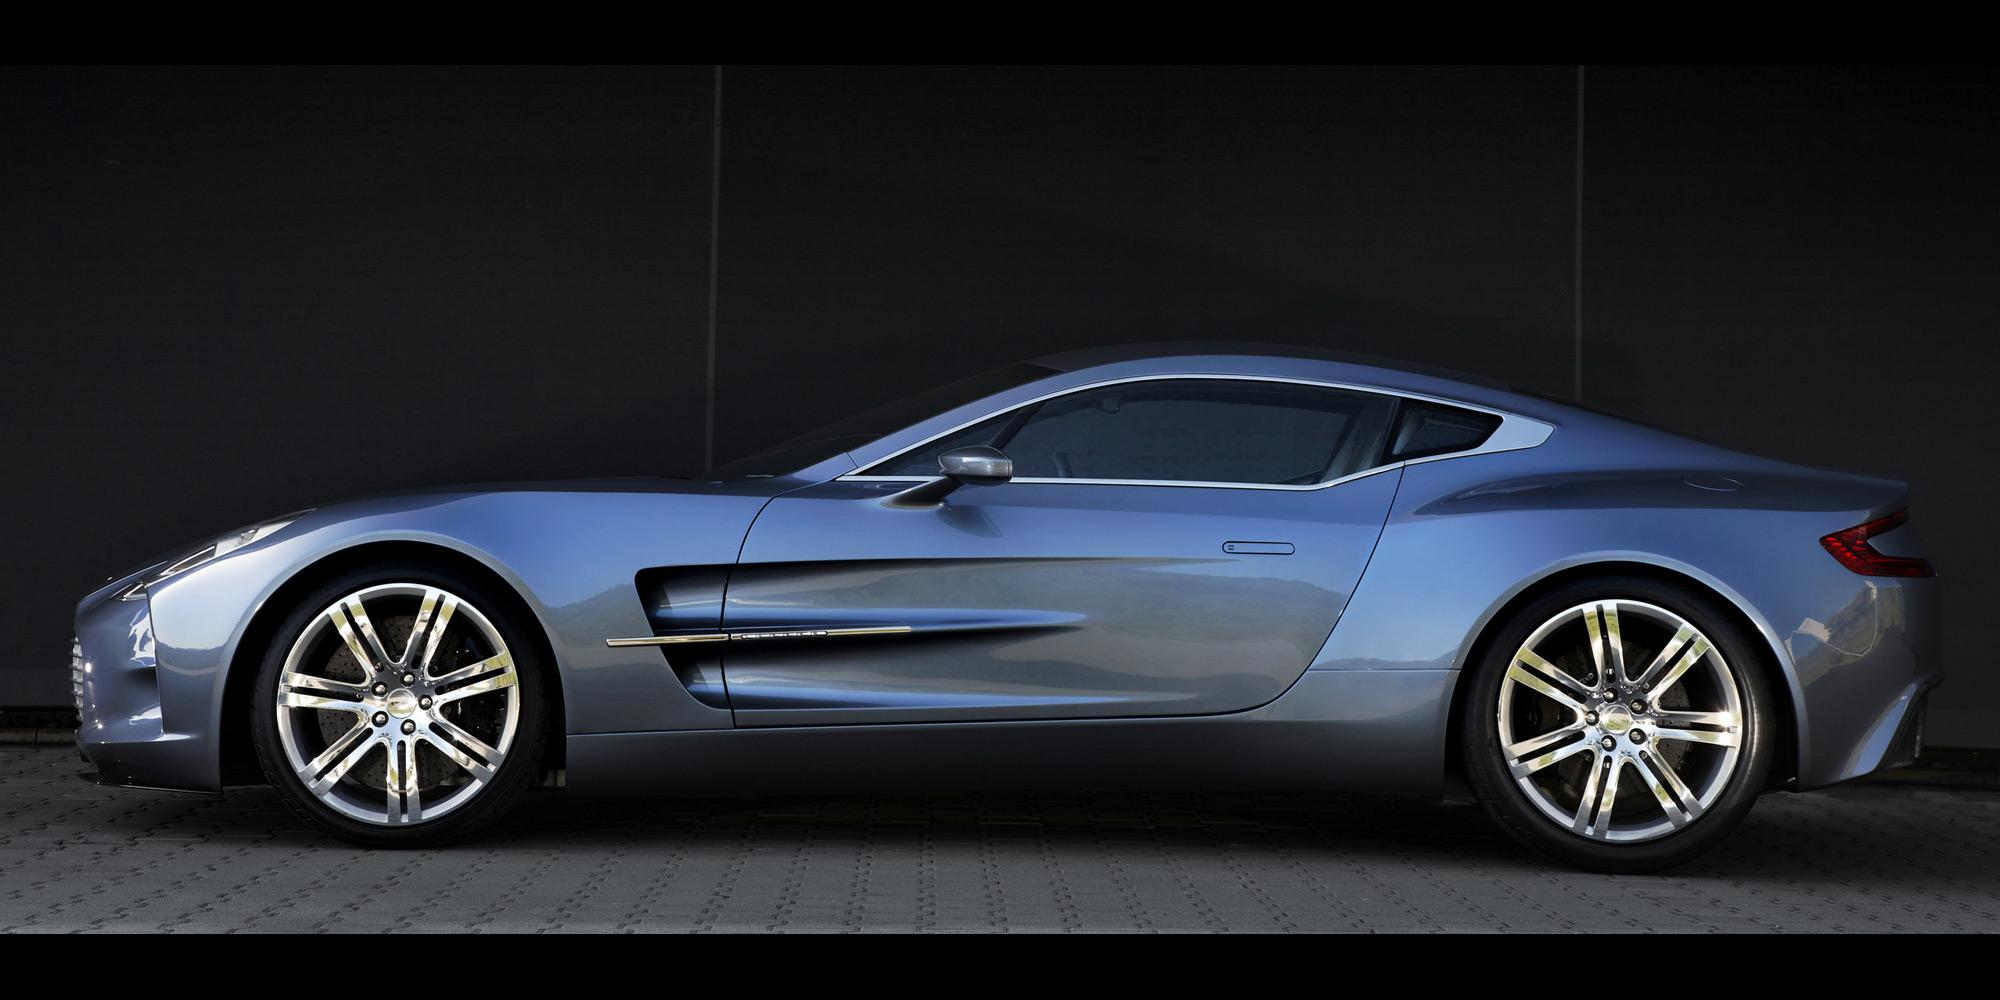 Aston-Martin-One77-16.jpg